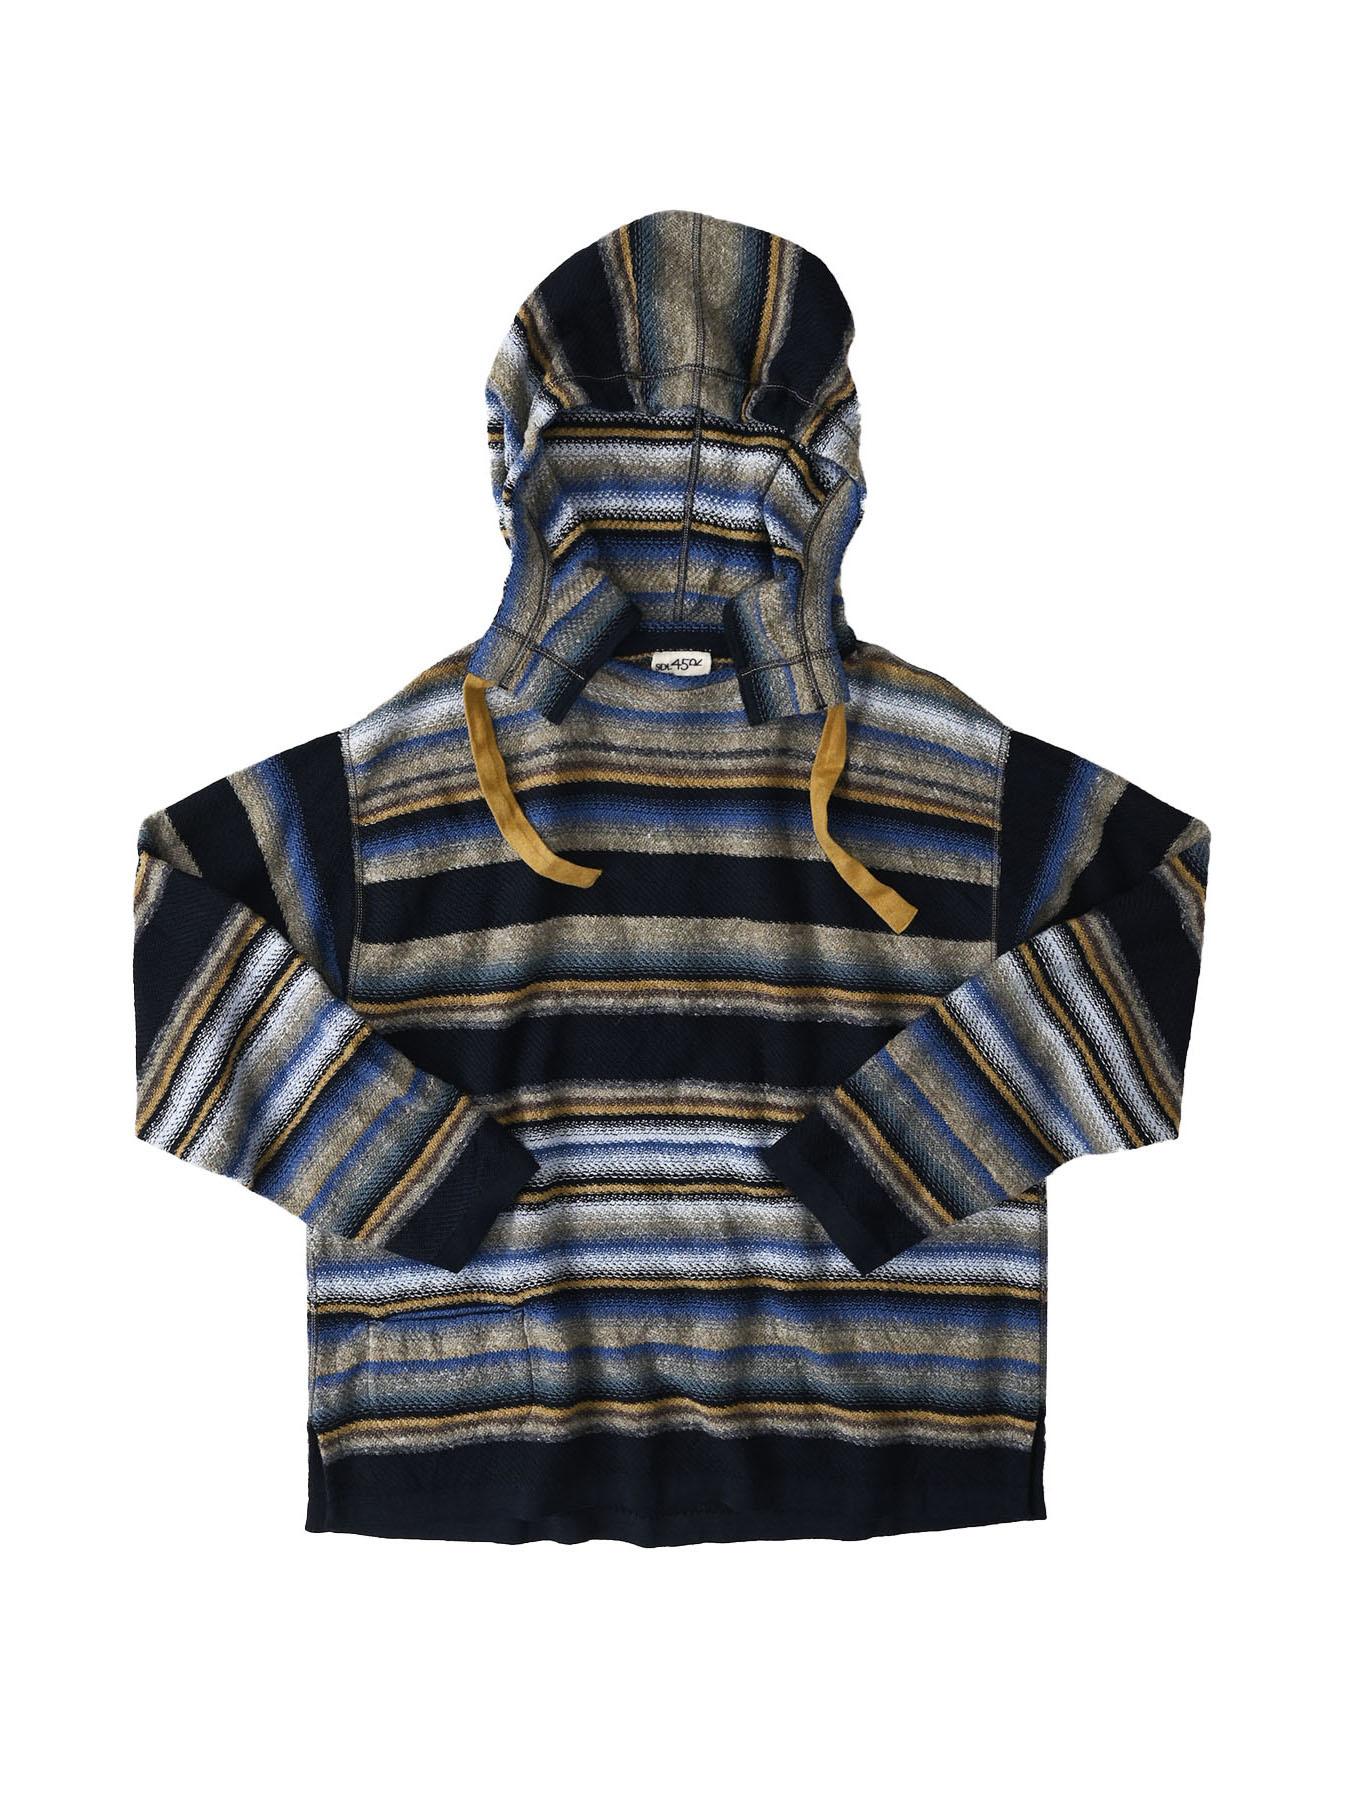 Indigo Rainbow Stripe Knit-sew 908 Umahiko Hoodie (0721)-1